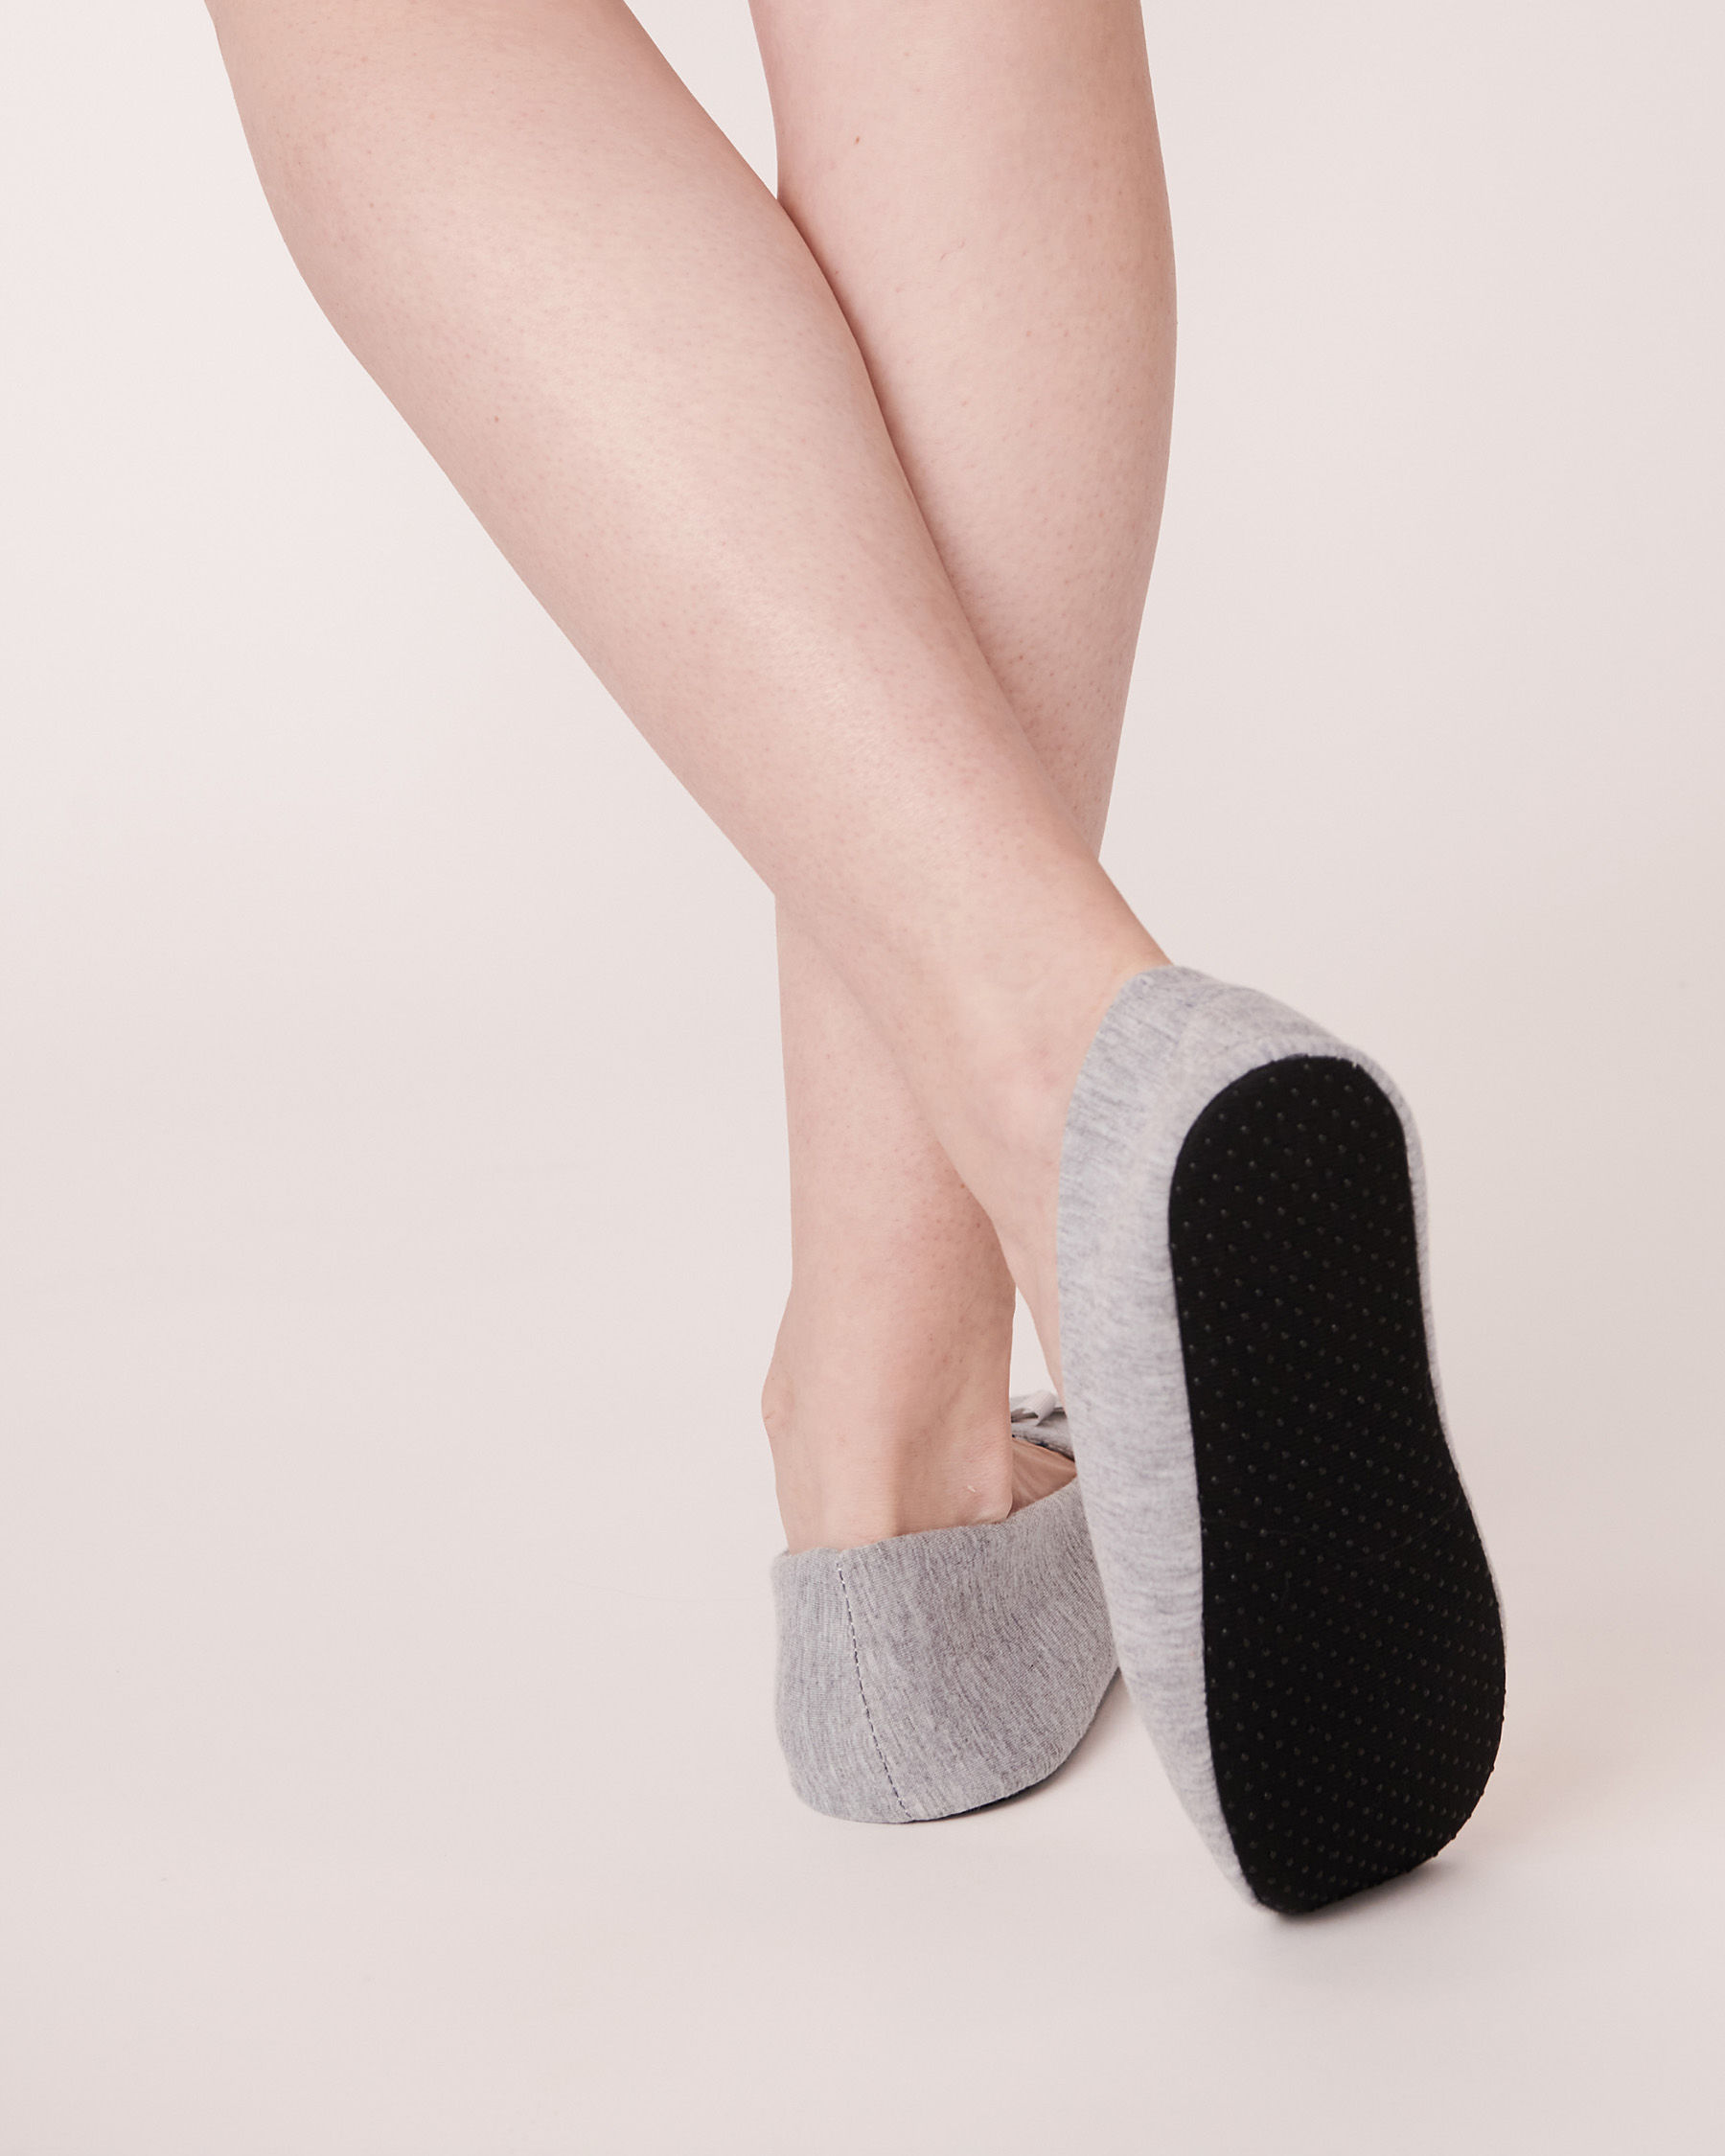 LA VIE EN ROSE Ballerina Slippers Grey 894-551-0-11 - View2